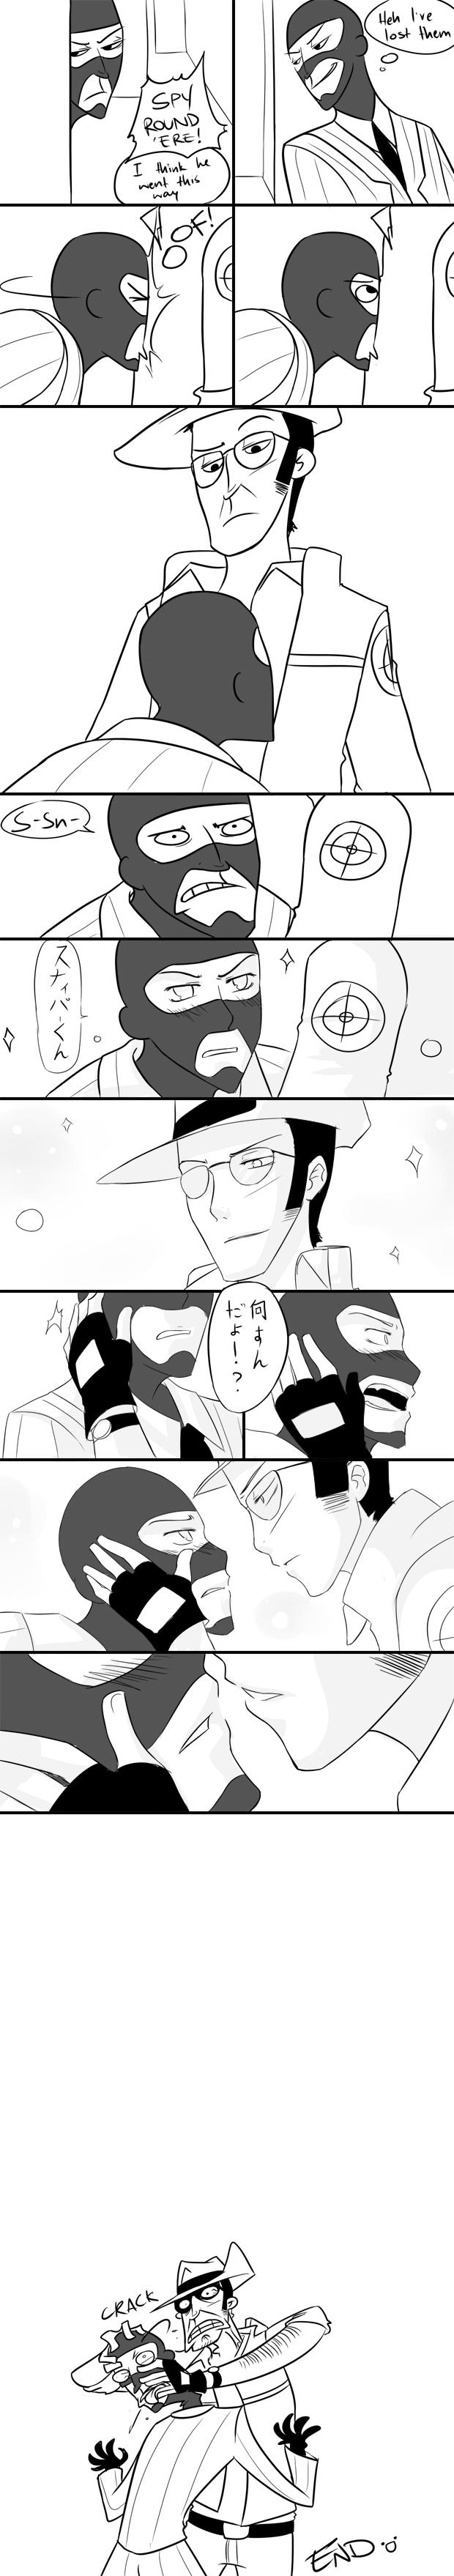 Den morsomme tråden! - Page 5 TF2___Sho_shounen_by_frzdragon